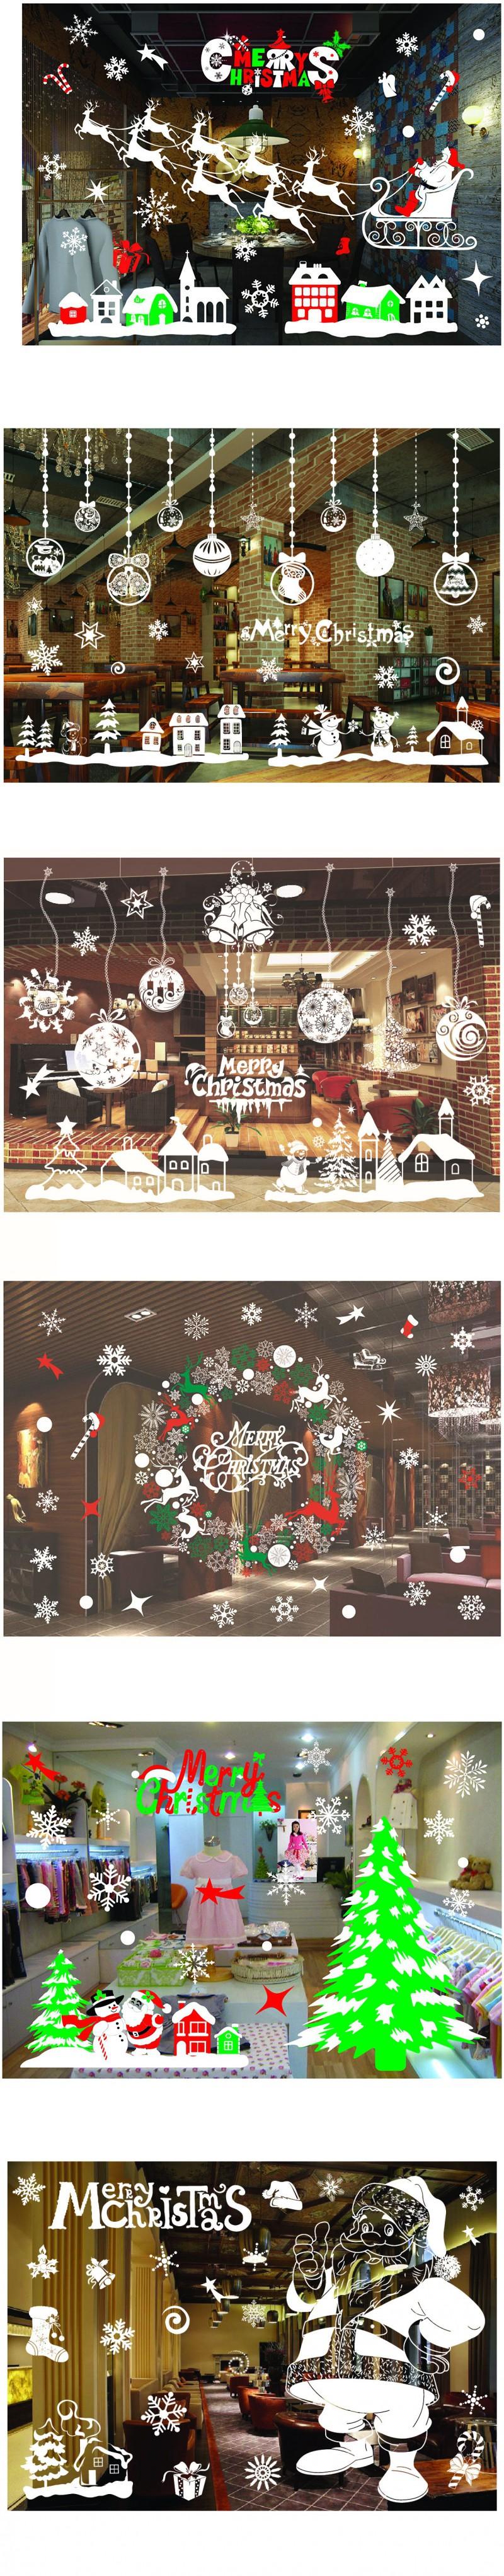 Diy new snow town christmas wall stickers window glass showcase diy new snow town christmas wall stickers window glass showcase sticker decorative wall decals adornos navidad xmas home decor amipublicfo Choice Image